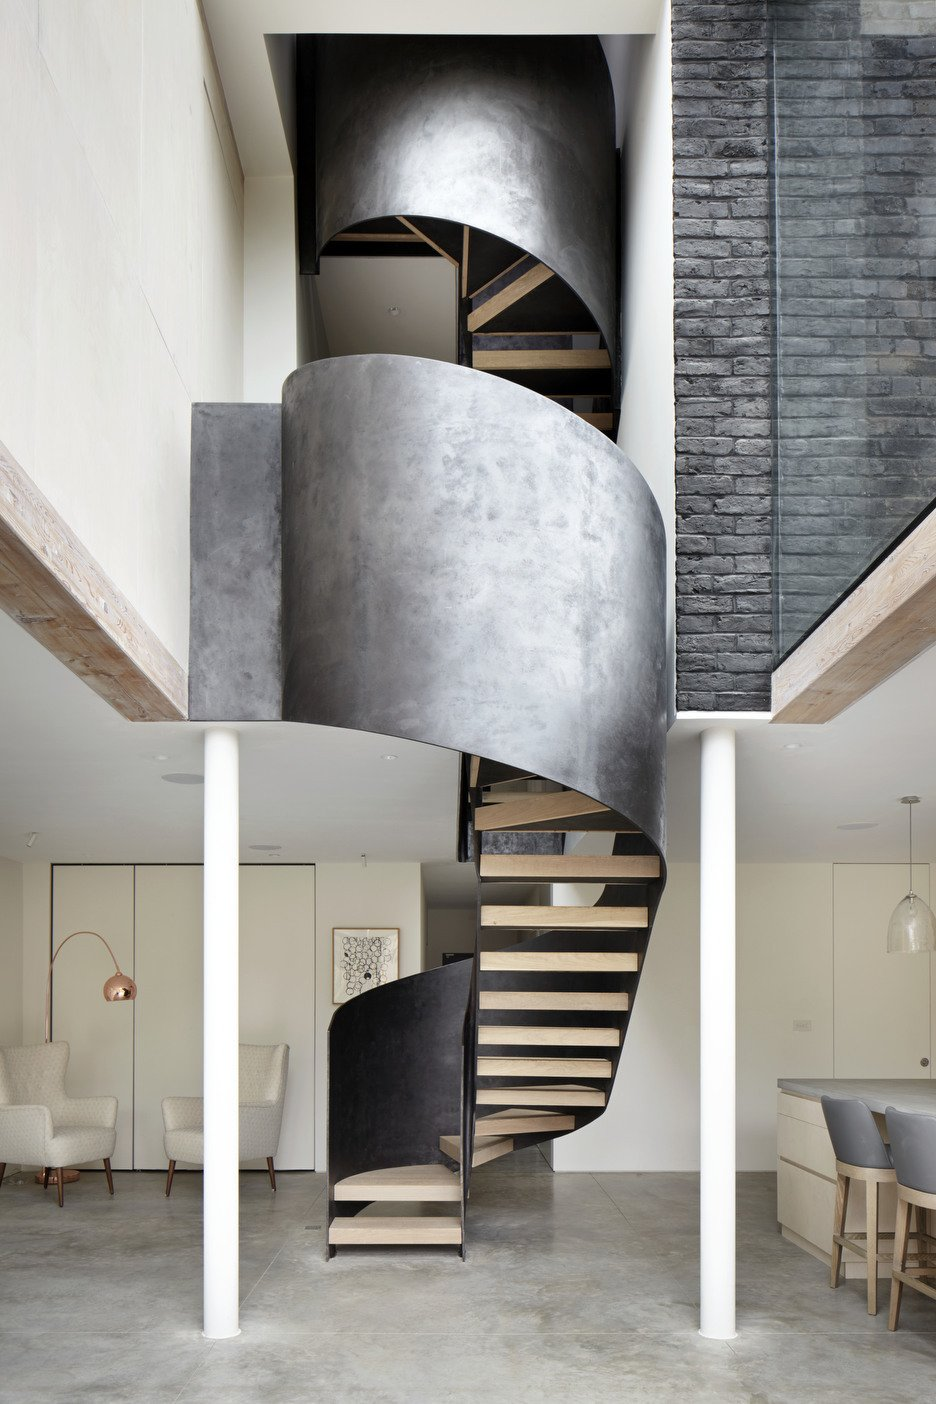 Architect: Cousins & Cousins Architects Contractor: Romark Projects Ltd Photography: Jack Hobhouse